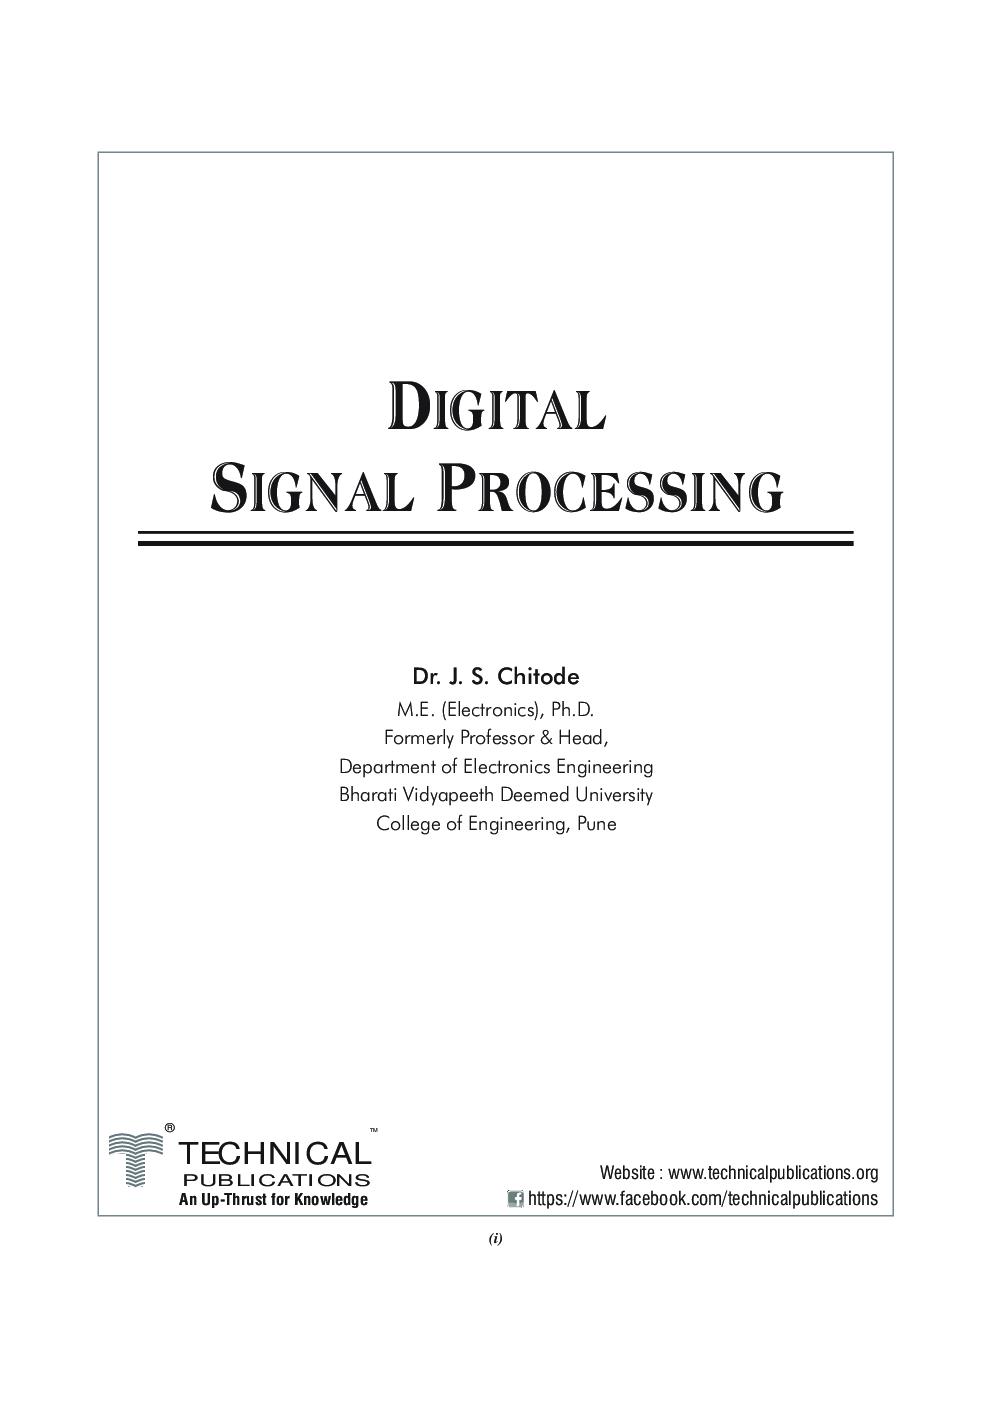 Digital Signal Processing For VTU - Page 2